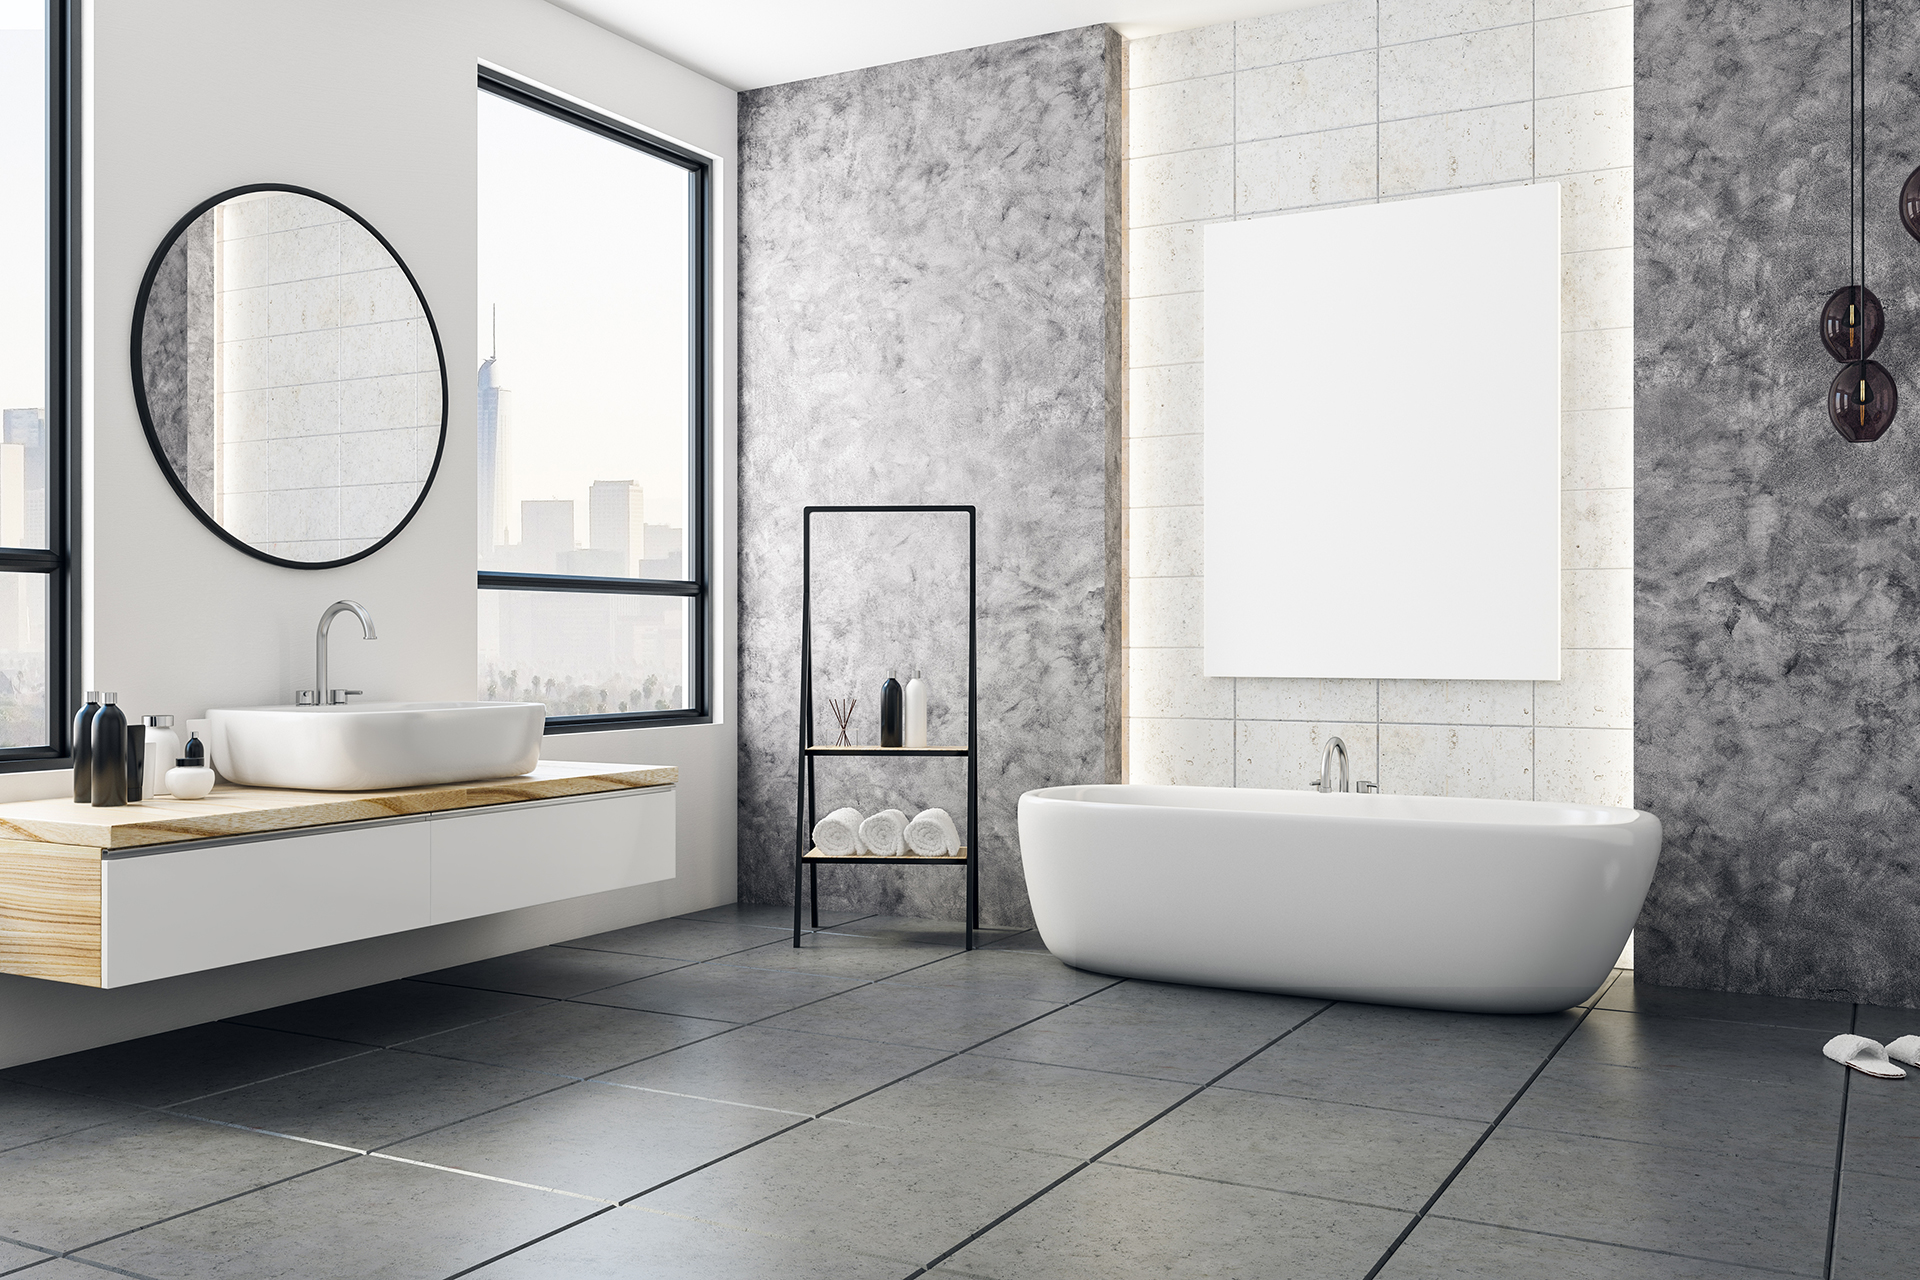 Bathroom Fitting - NGM Construction Services Ltd